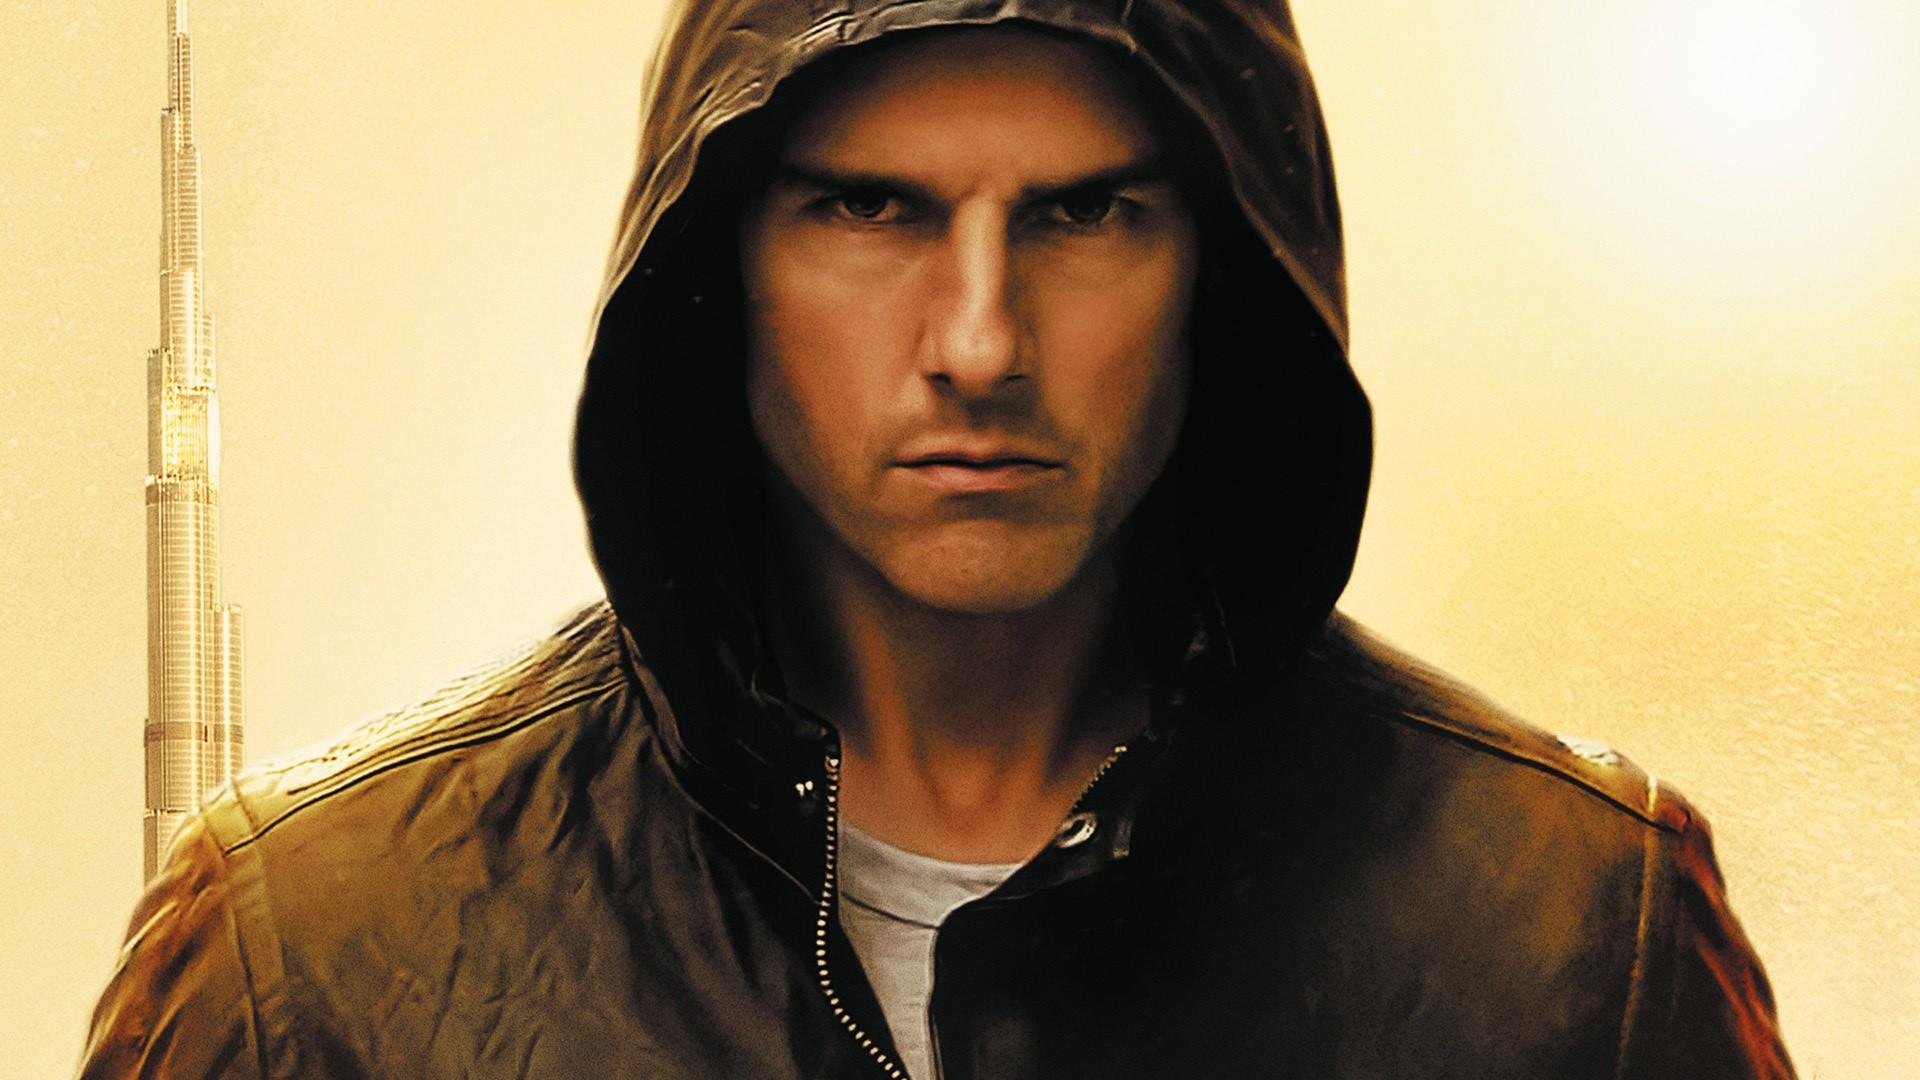 Tom Cruise Hd Wallpaper 3249 1920x1080 px HDWallSourcecom 1920x1080